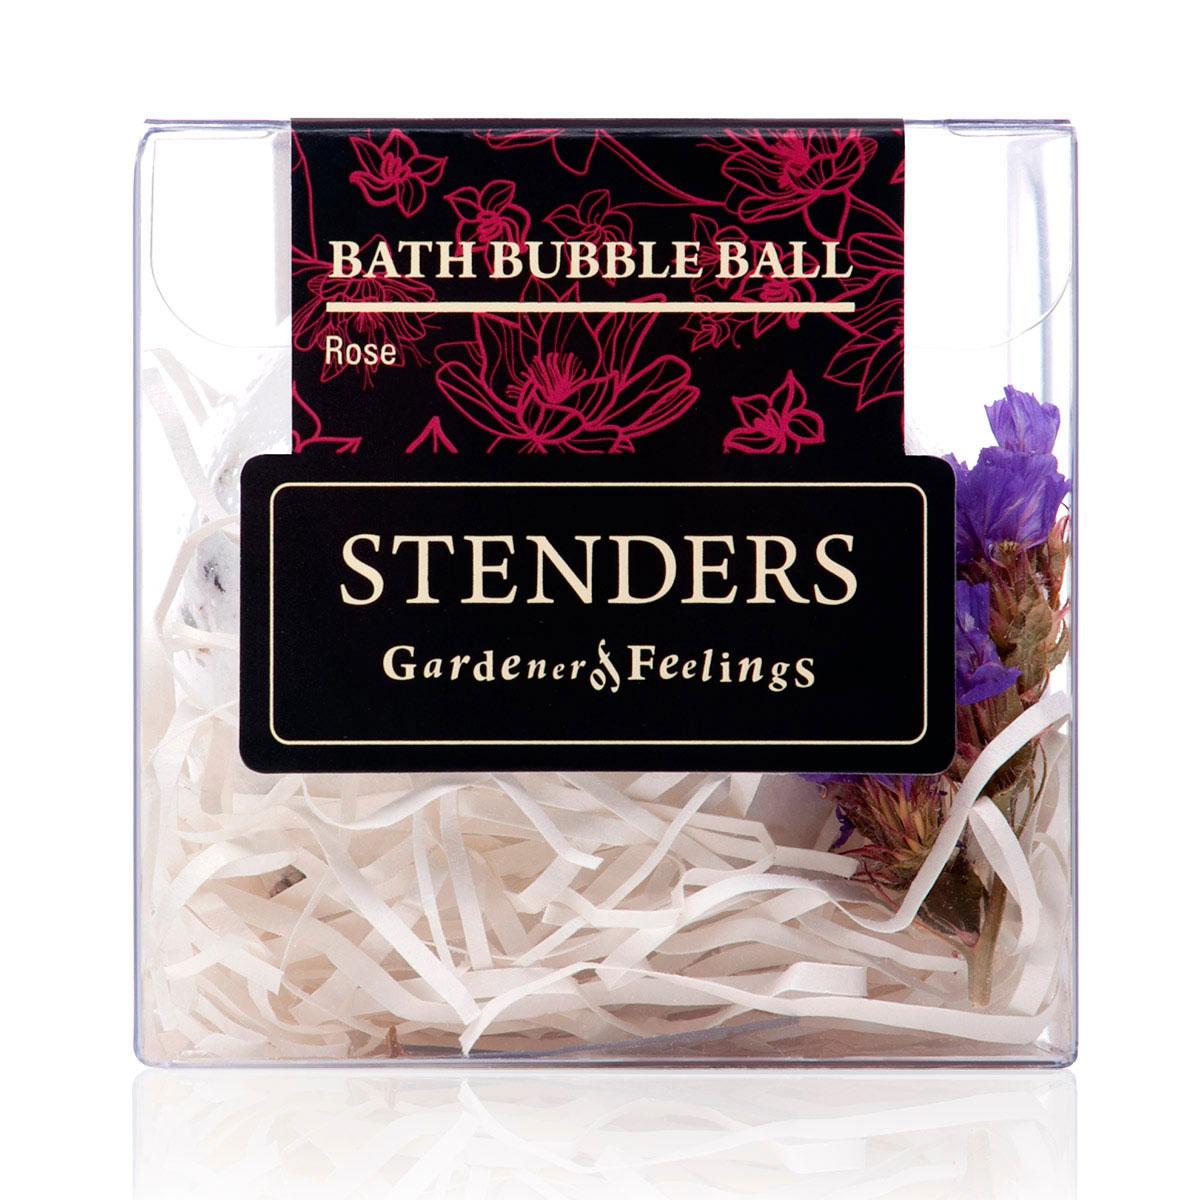 Stenders Бурлящий шар Розовый, 125 г bio2you шарик для ванны восточное 125 г